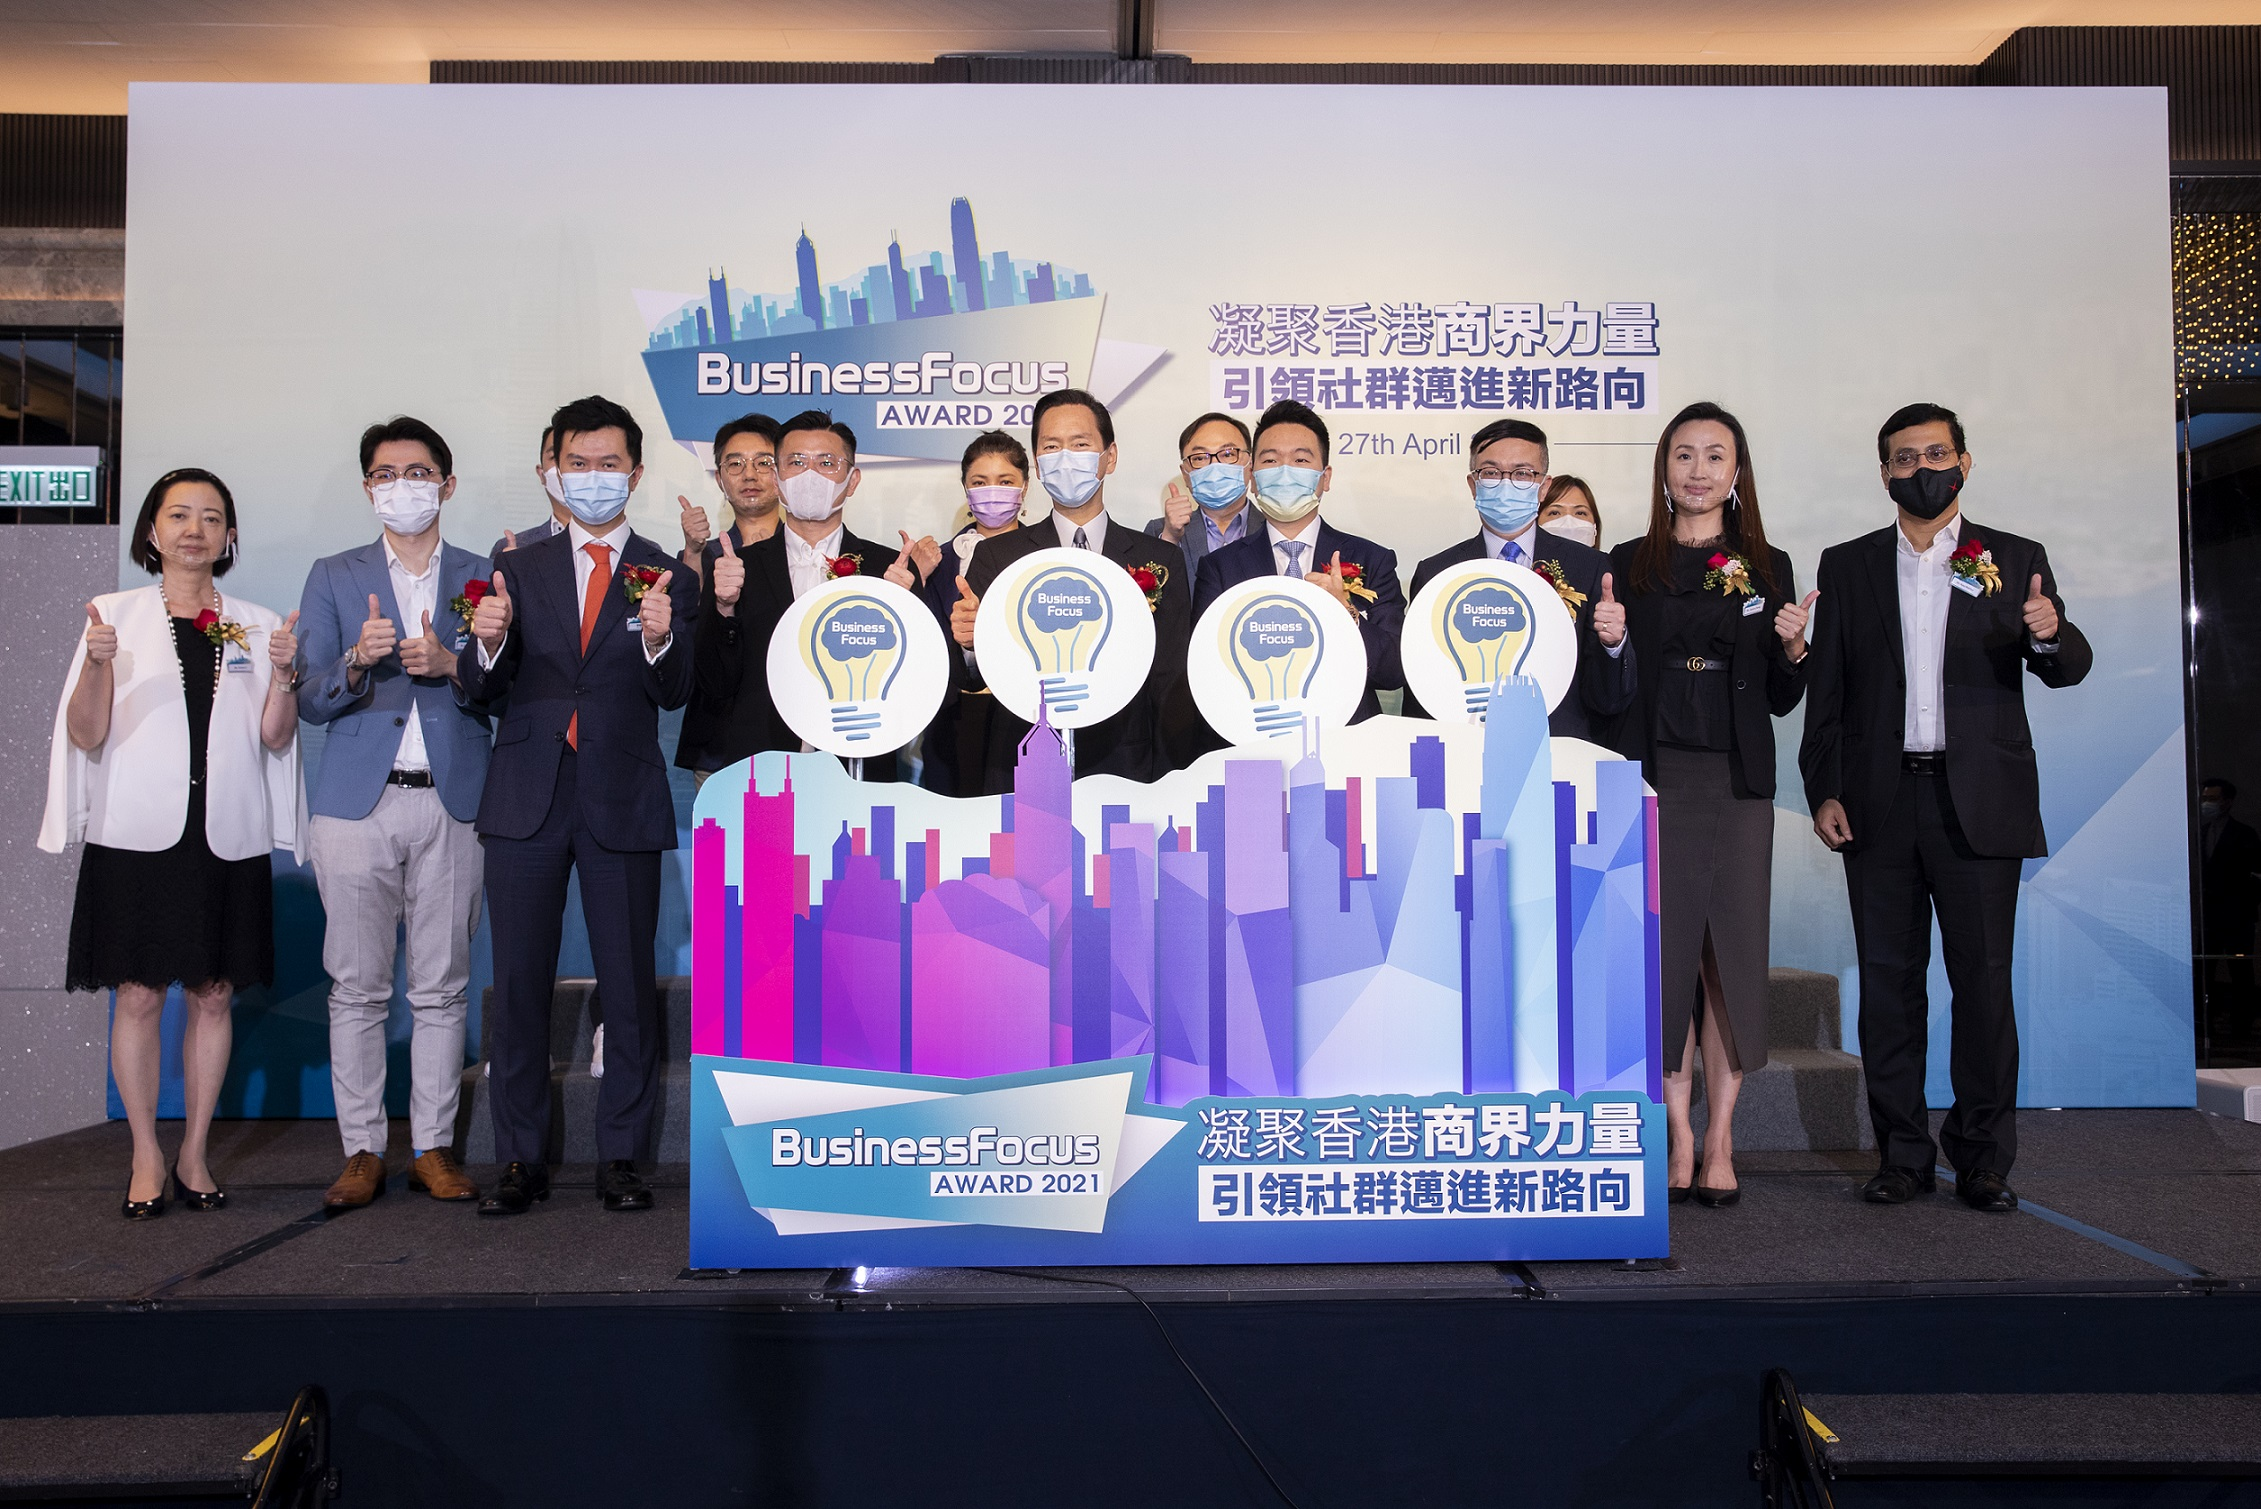 BusinessFocus Award 2021 Grand Ceremony  Winners Unveiled